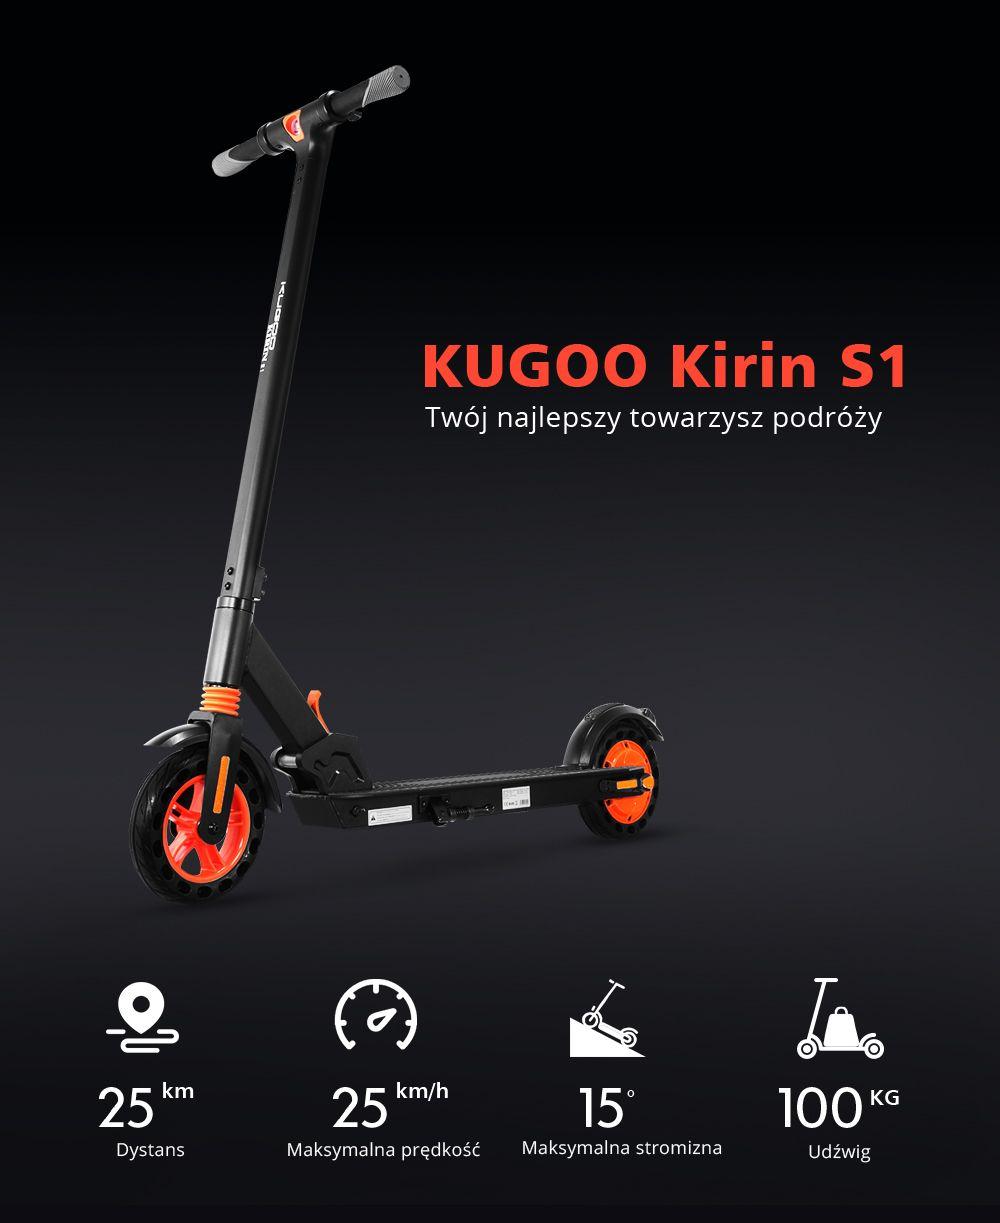 Hulajnoga elektryczna Kugoo kirin S1